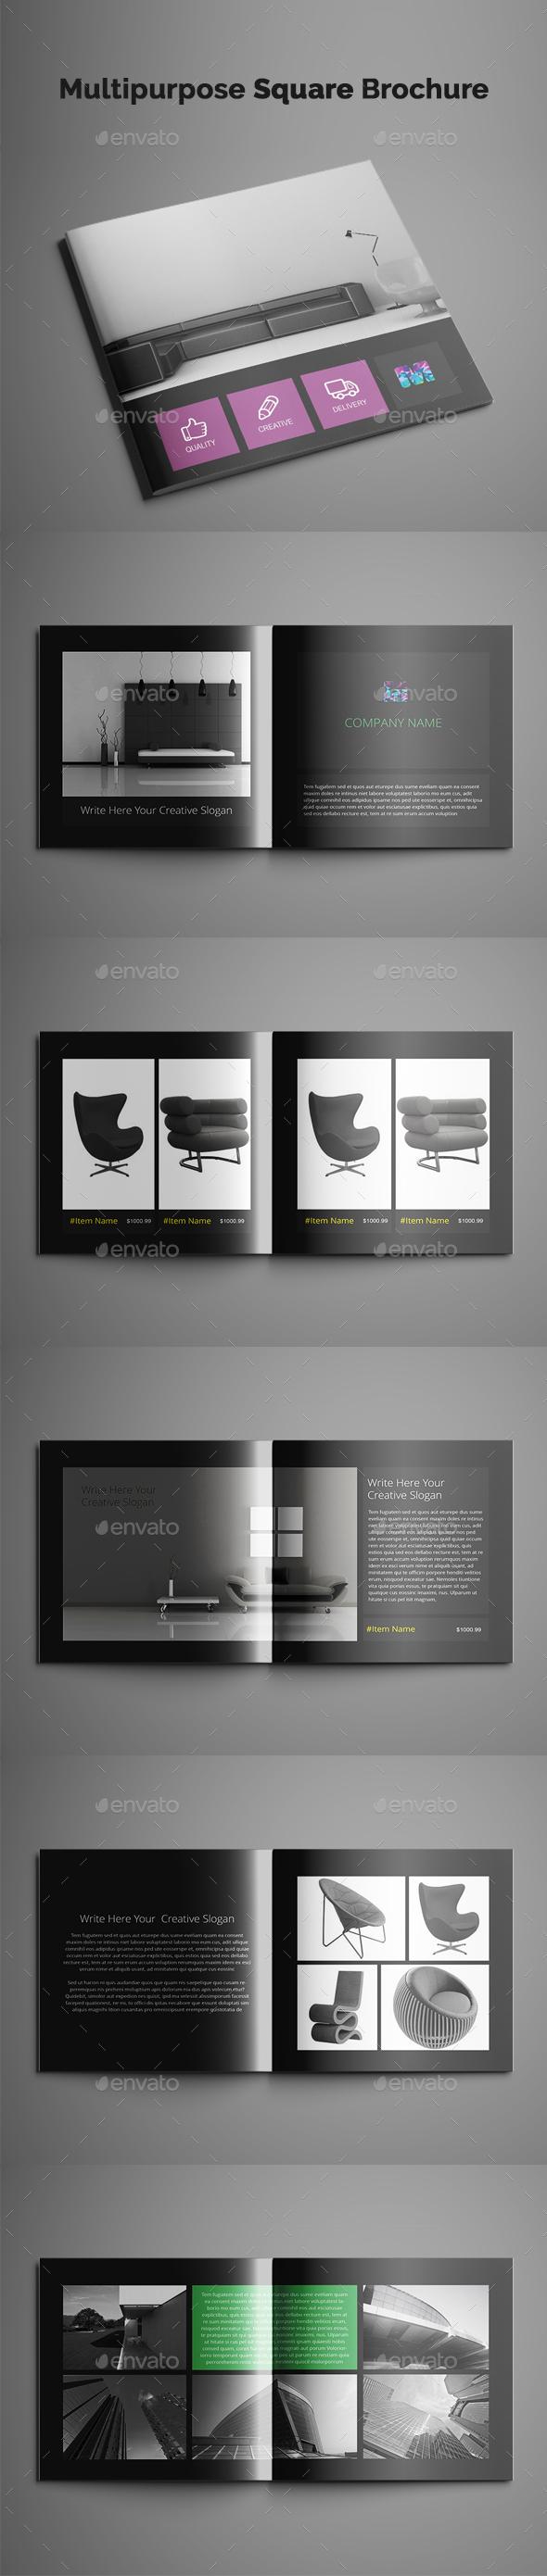 Multipurpose Square Brochure - Brochures Print Templates